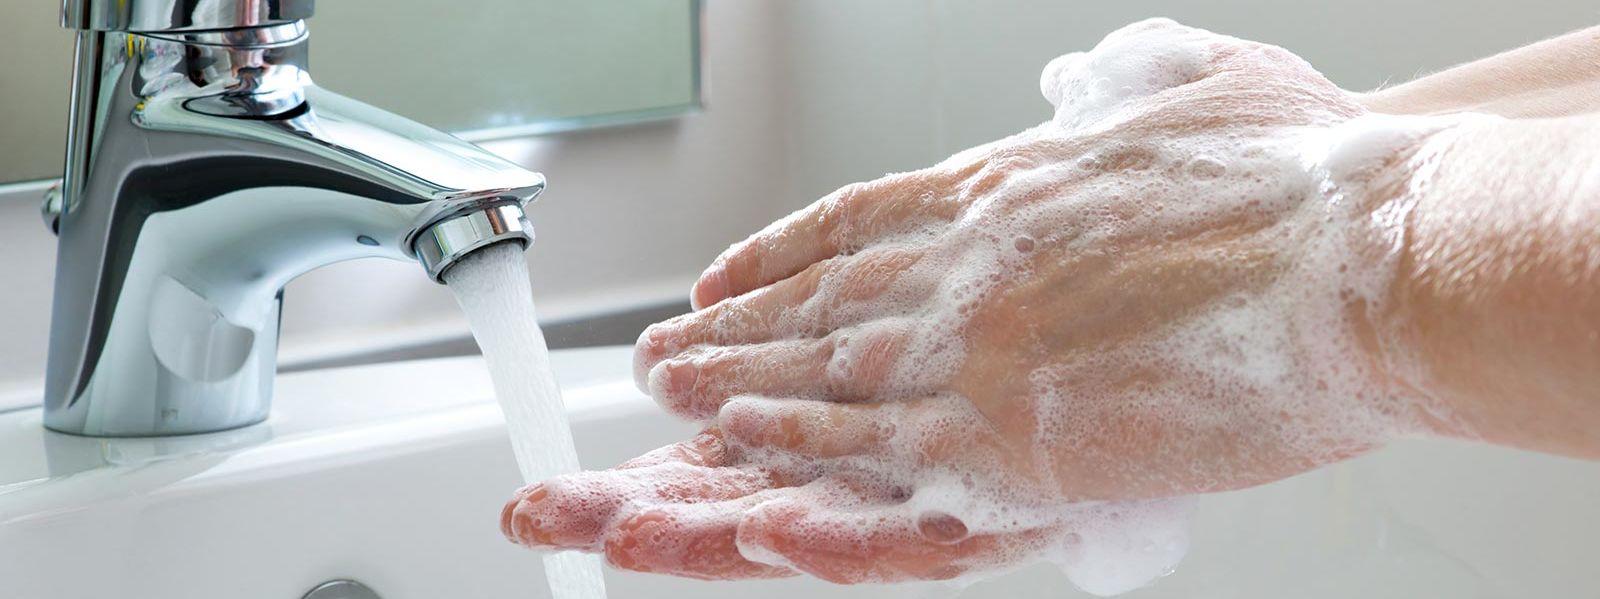 Washing hands in a bathroom sink.